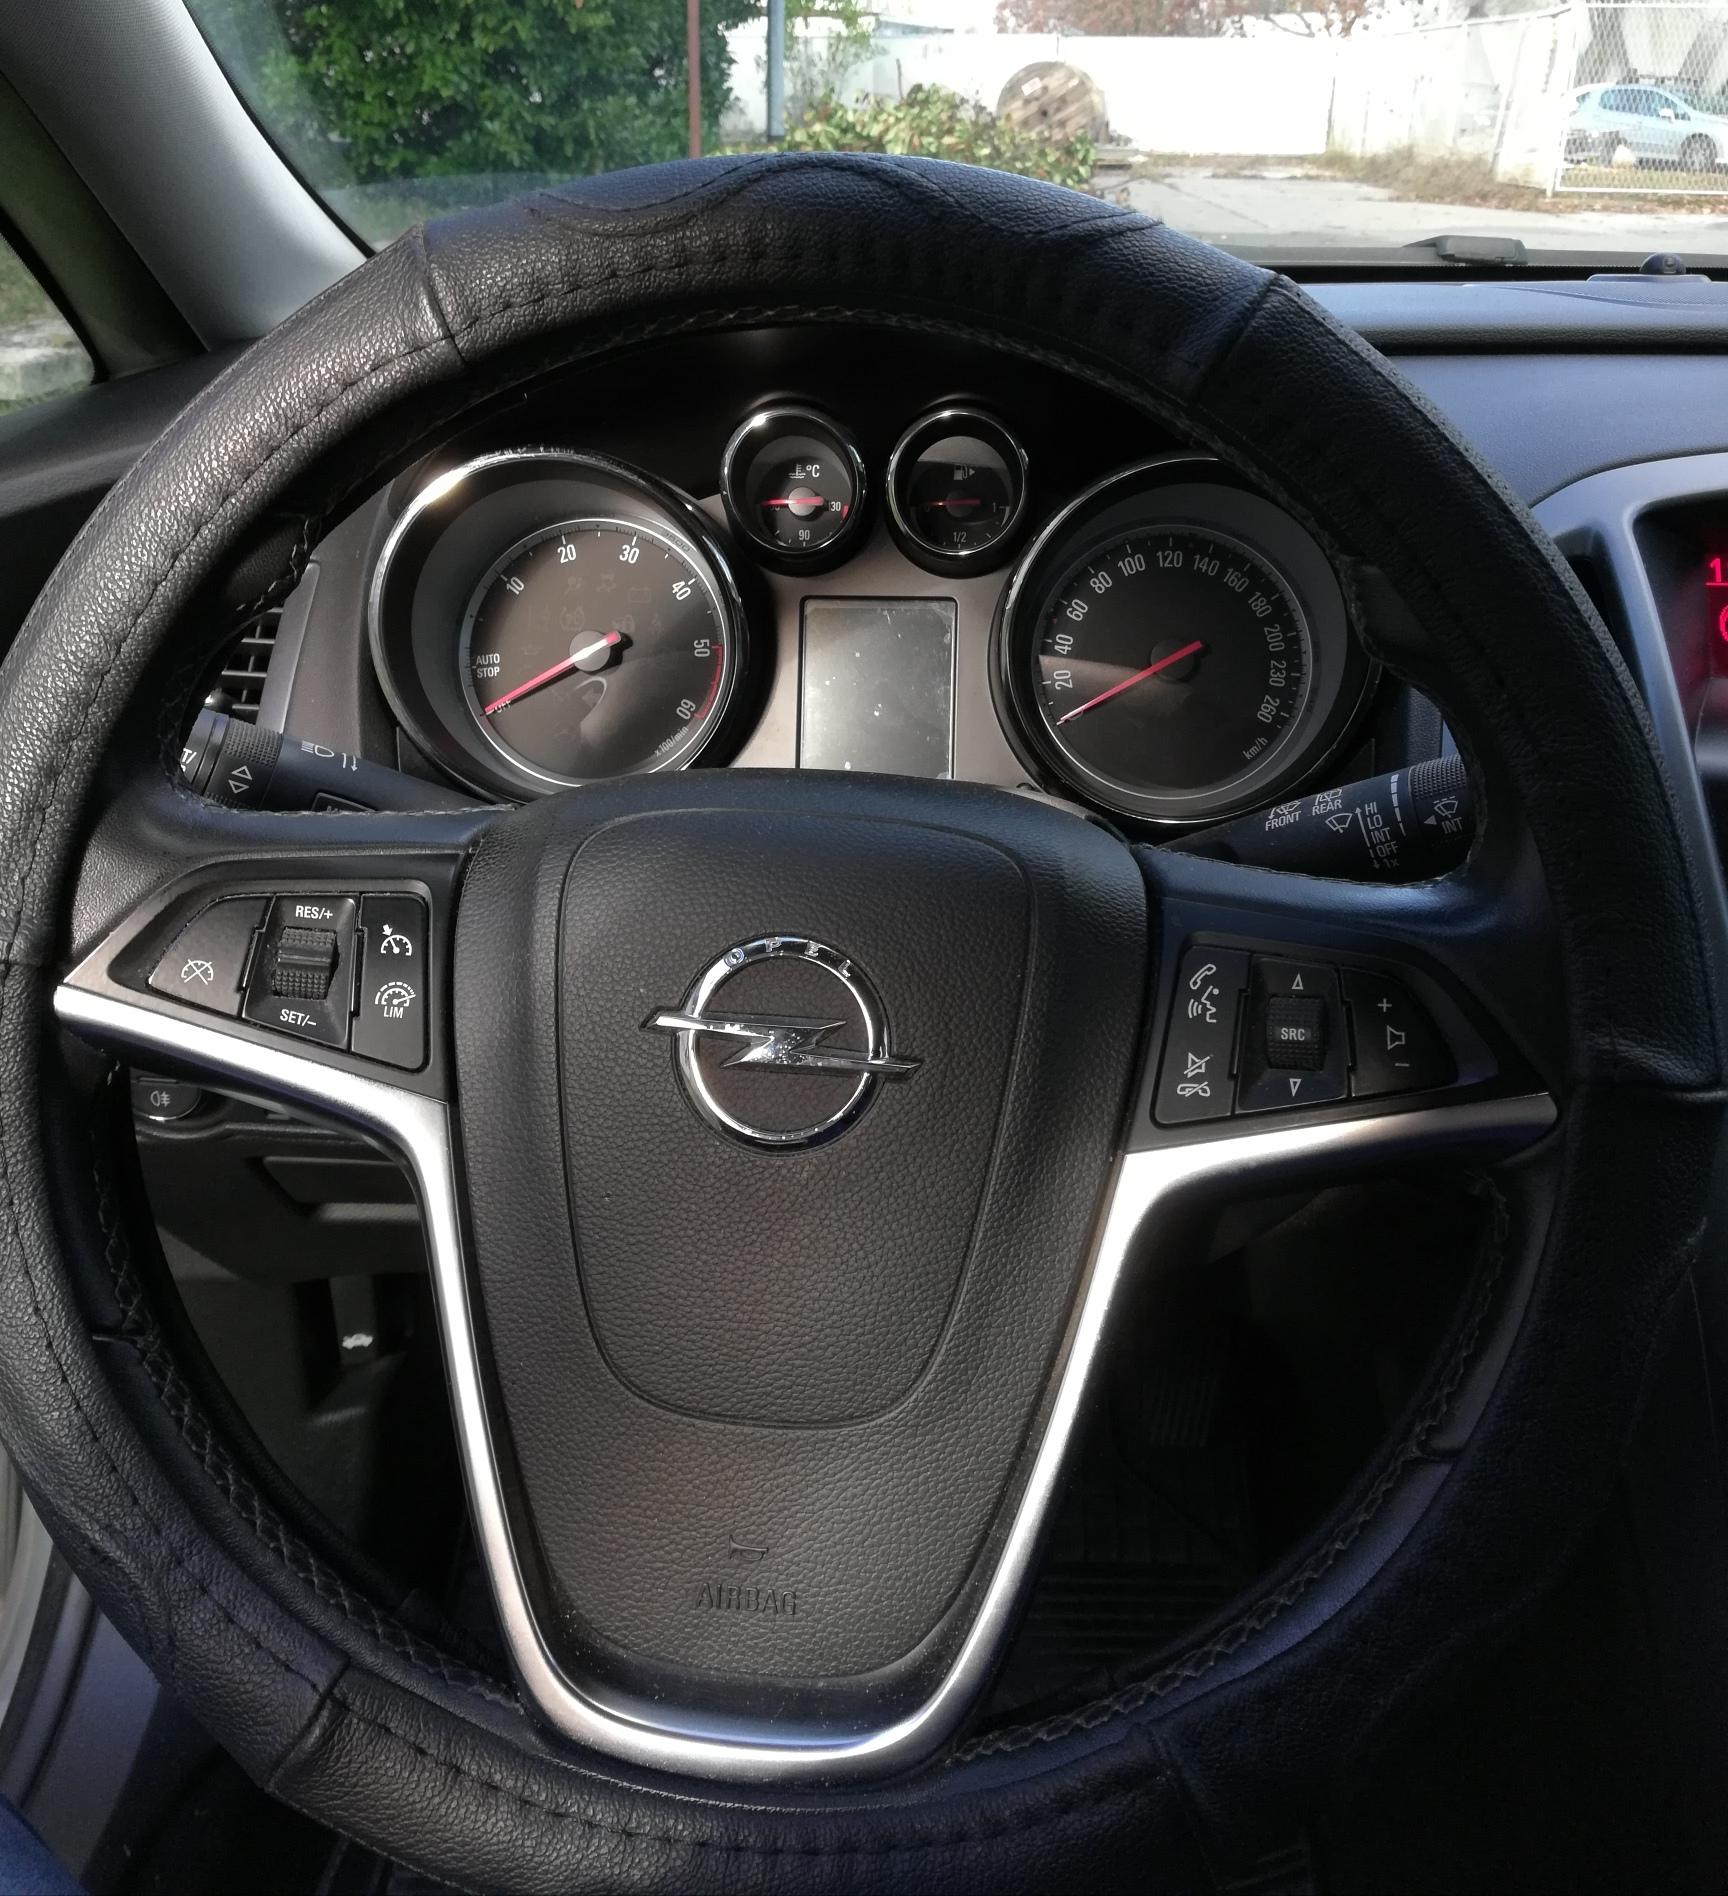 Opel Astra 1,6 cdti